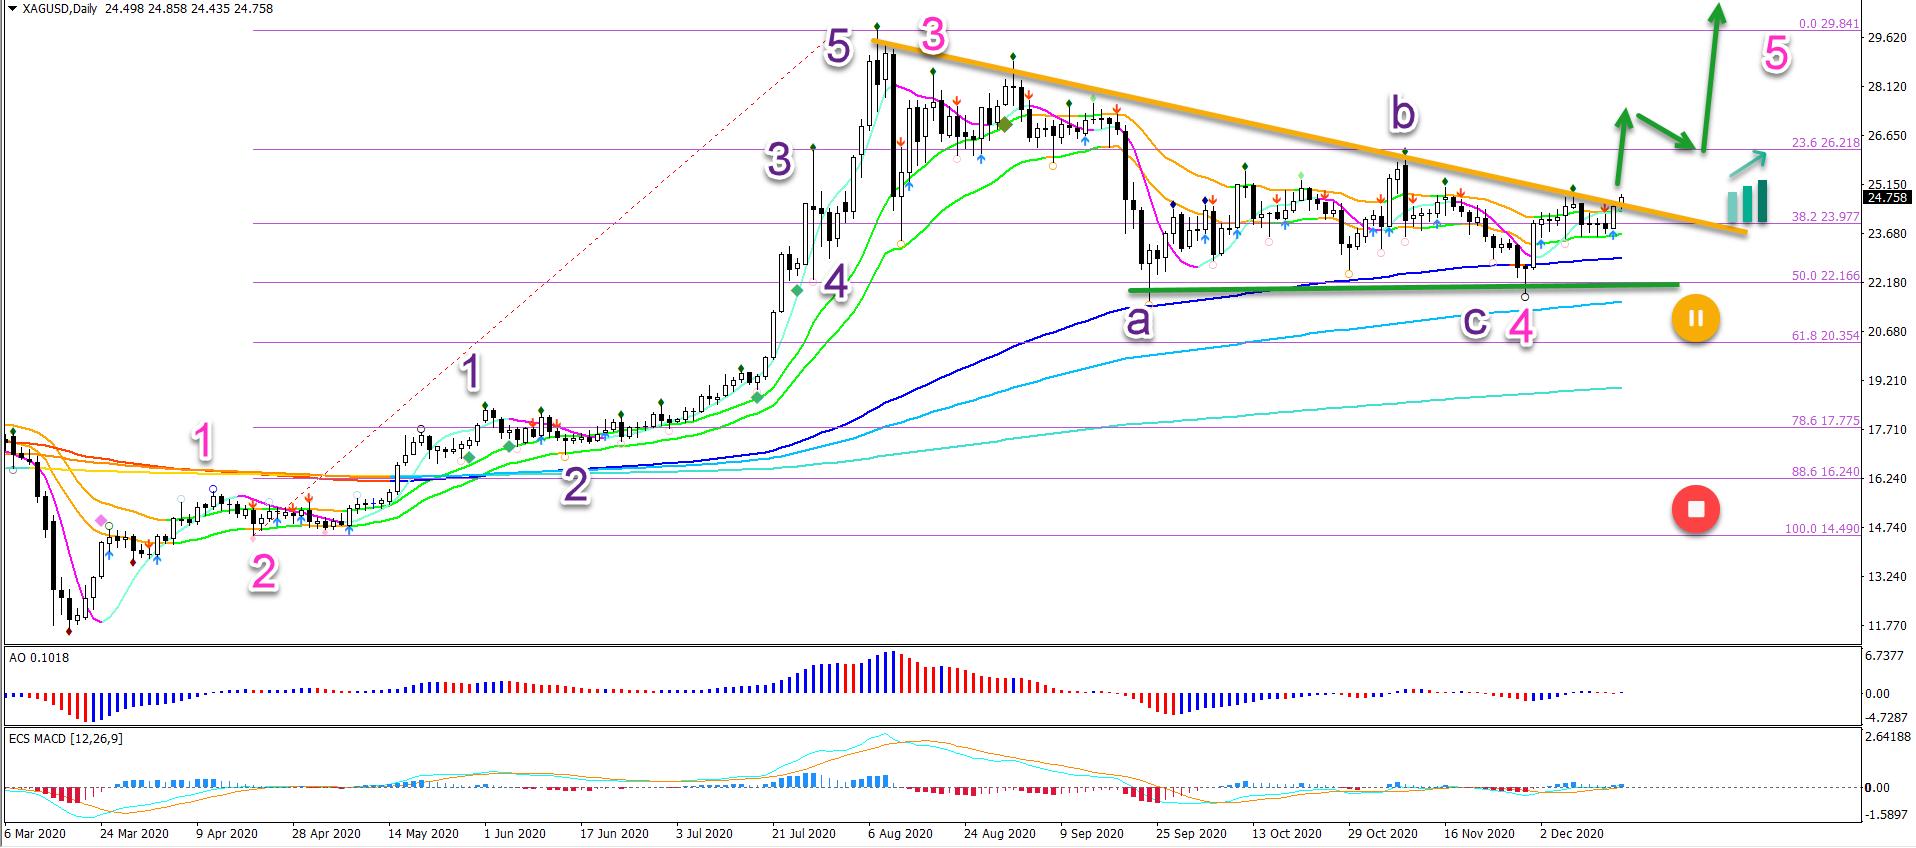 XAG/USD 16.12.2020 daily chart